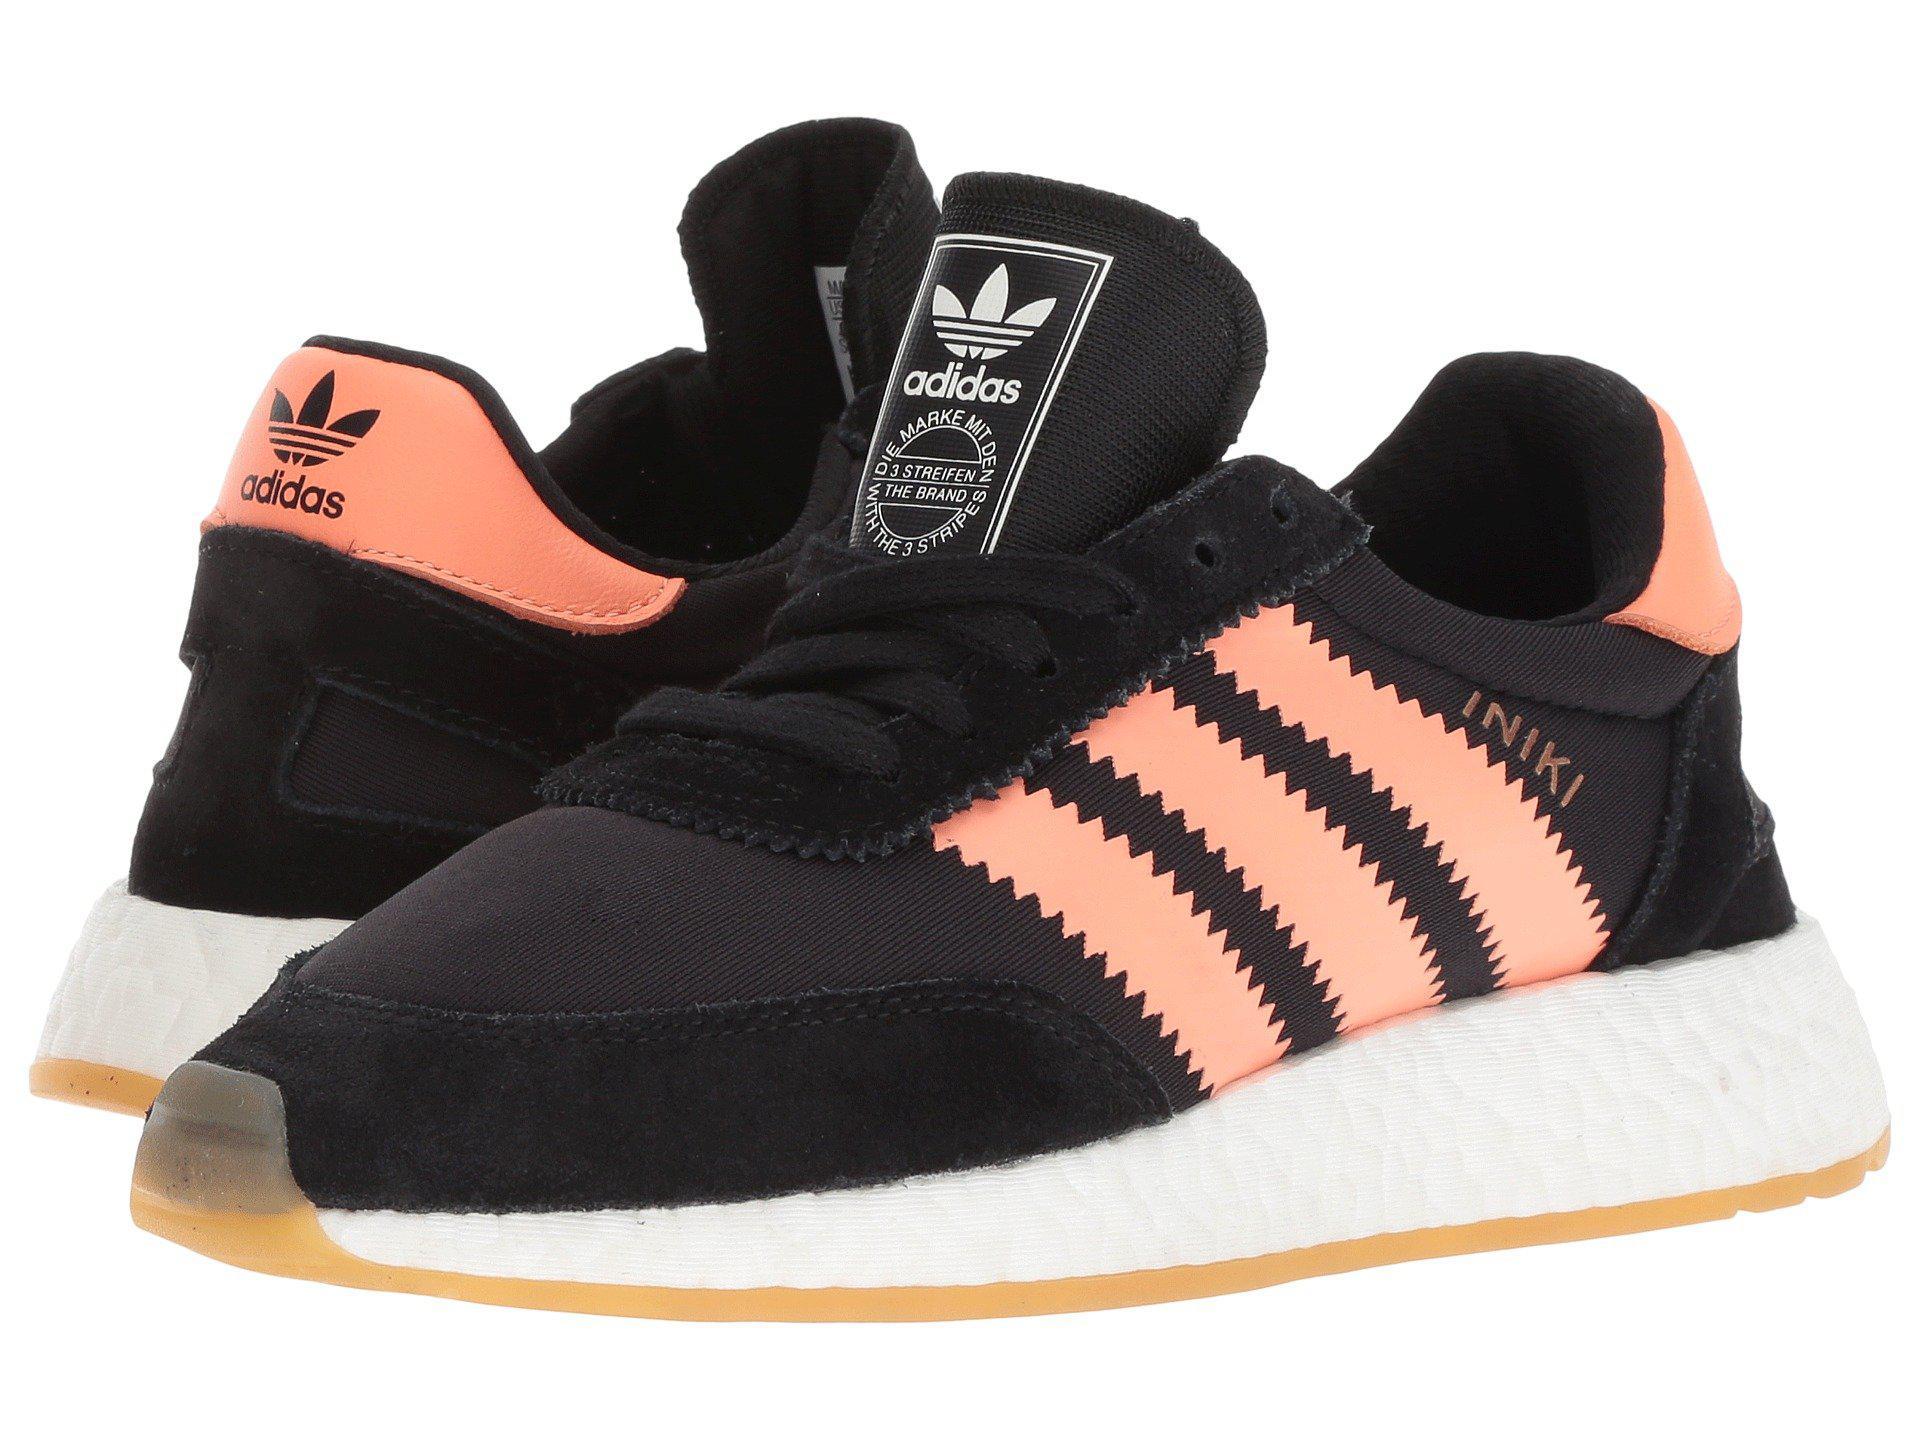 Shoes Lyst Women's Runner Adidas cblackseflorgum3 Iniki Boost SPTYfq